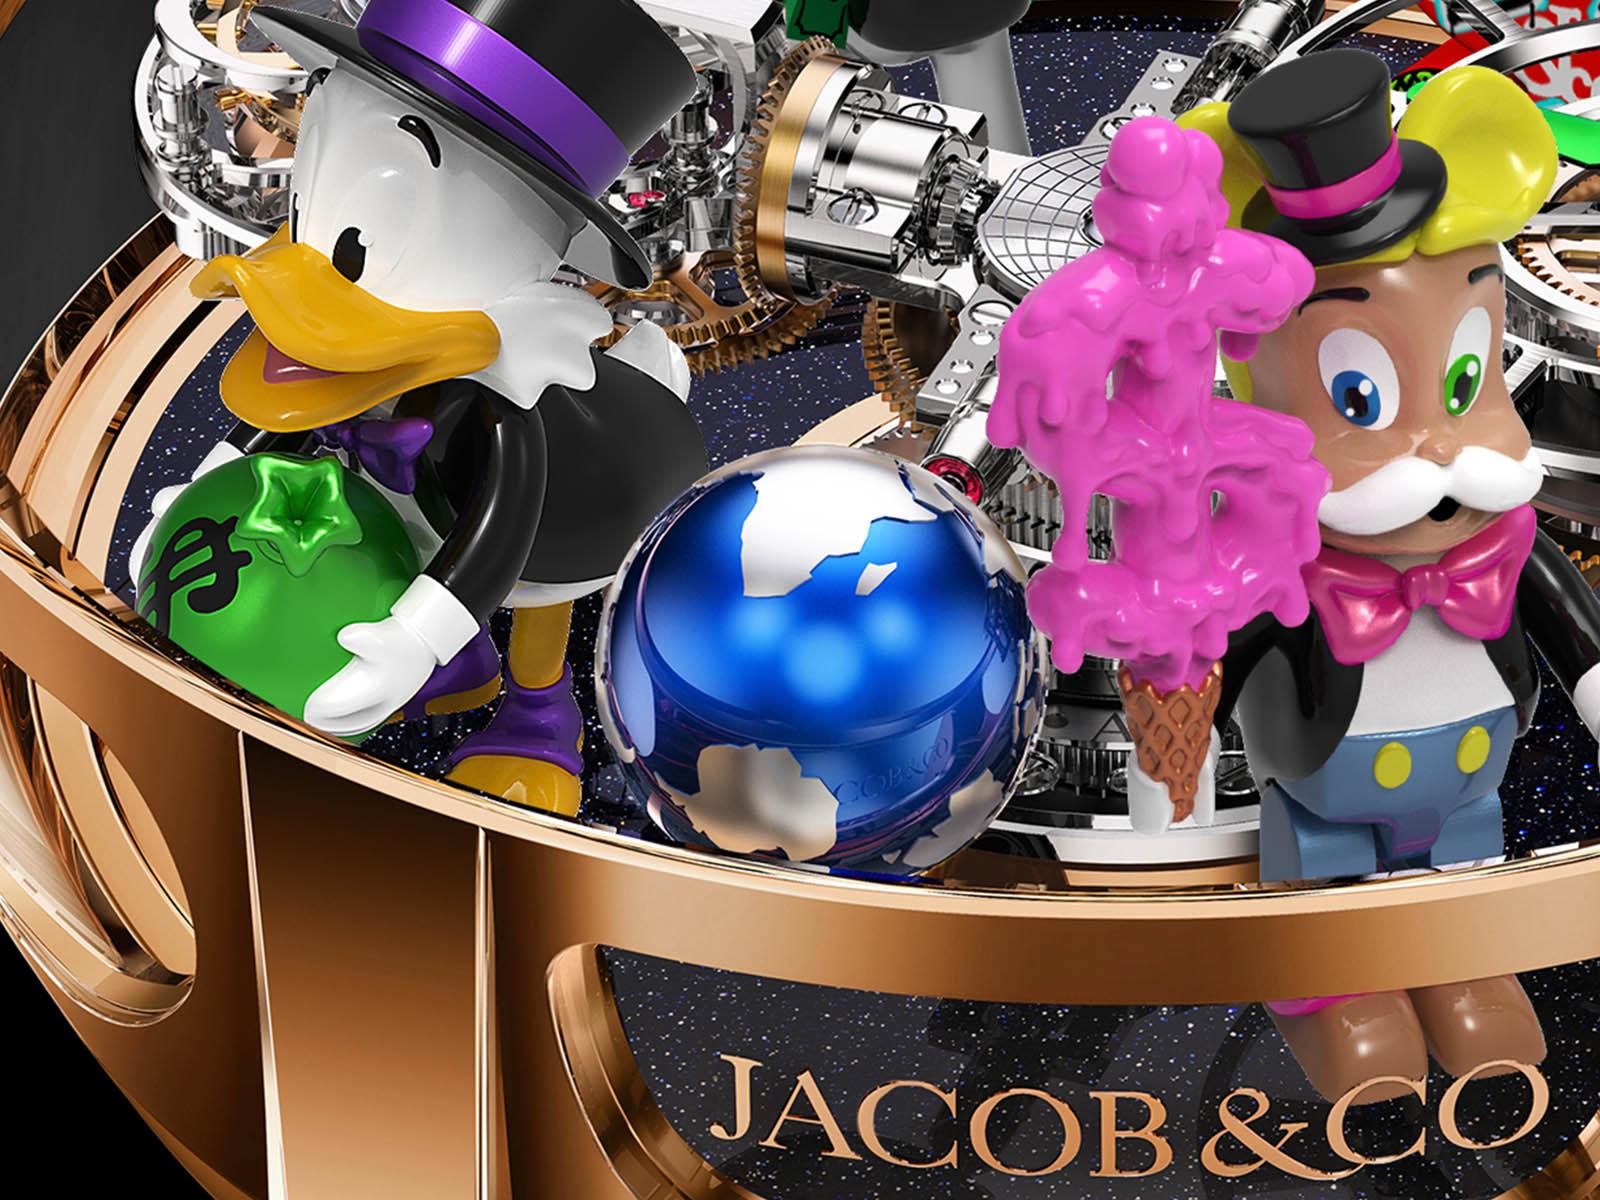 jacob-co-astronomia-alec-monopoly-7.jpg